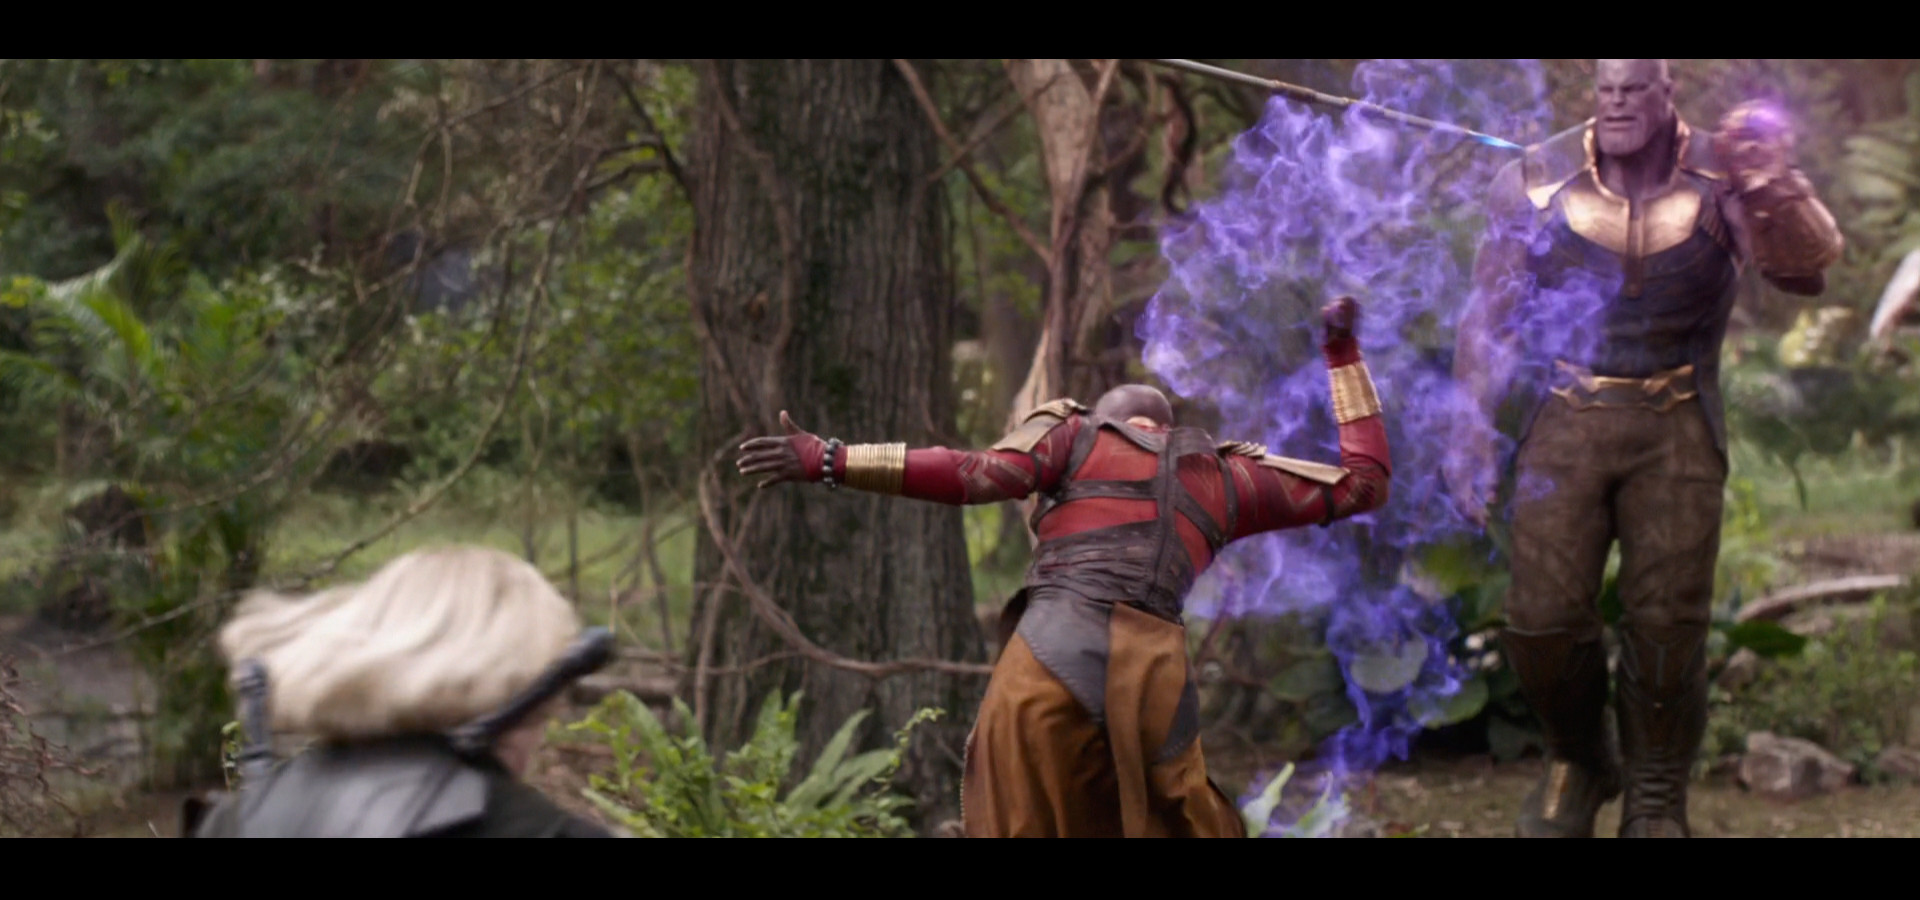 Scott knapp avengers screenshots 019